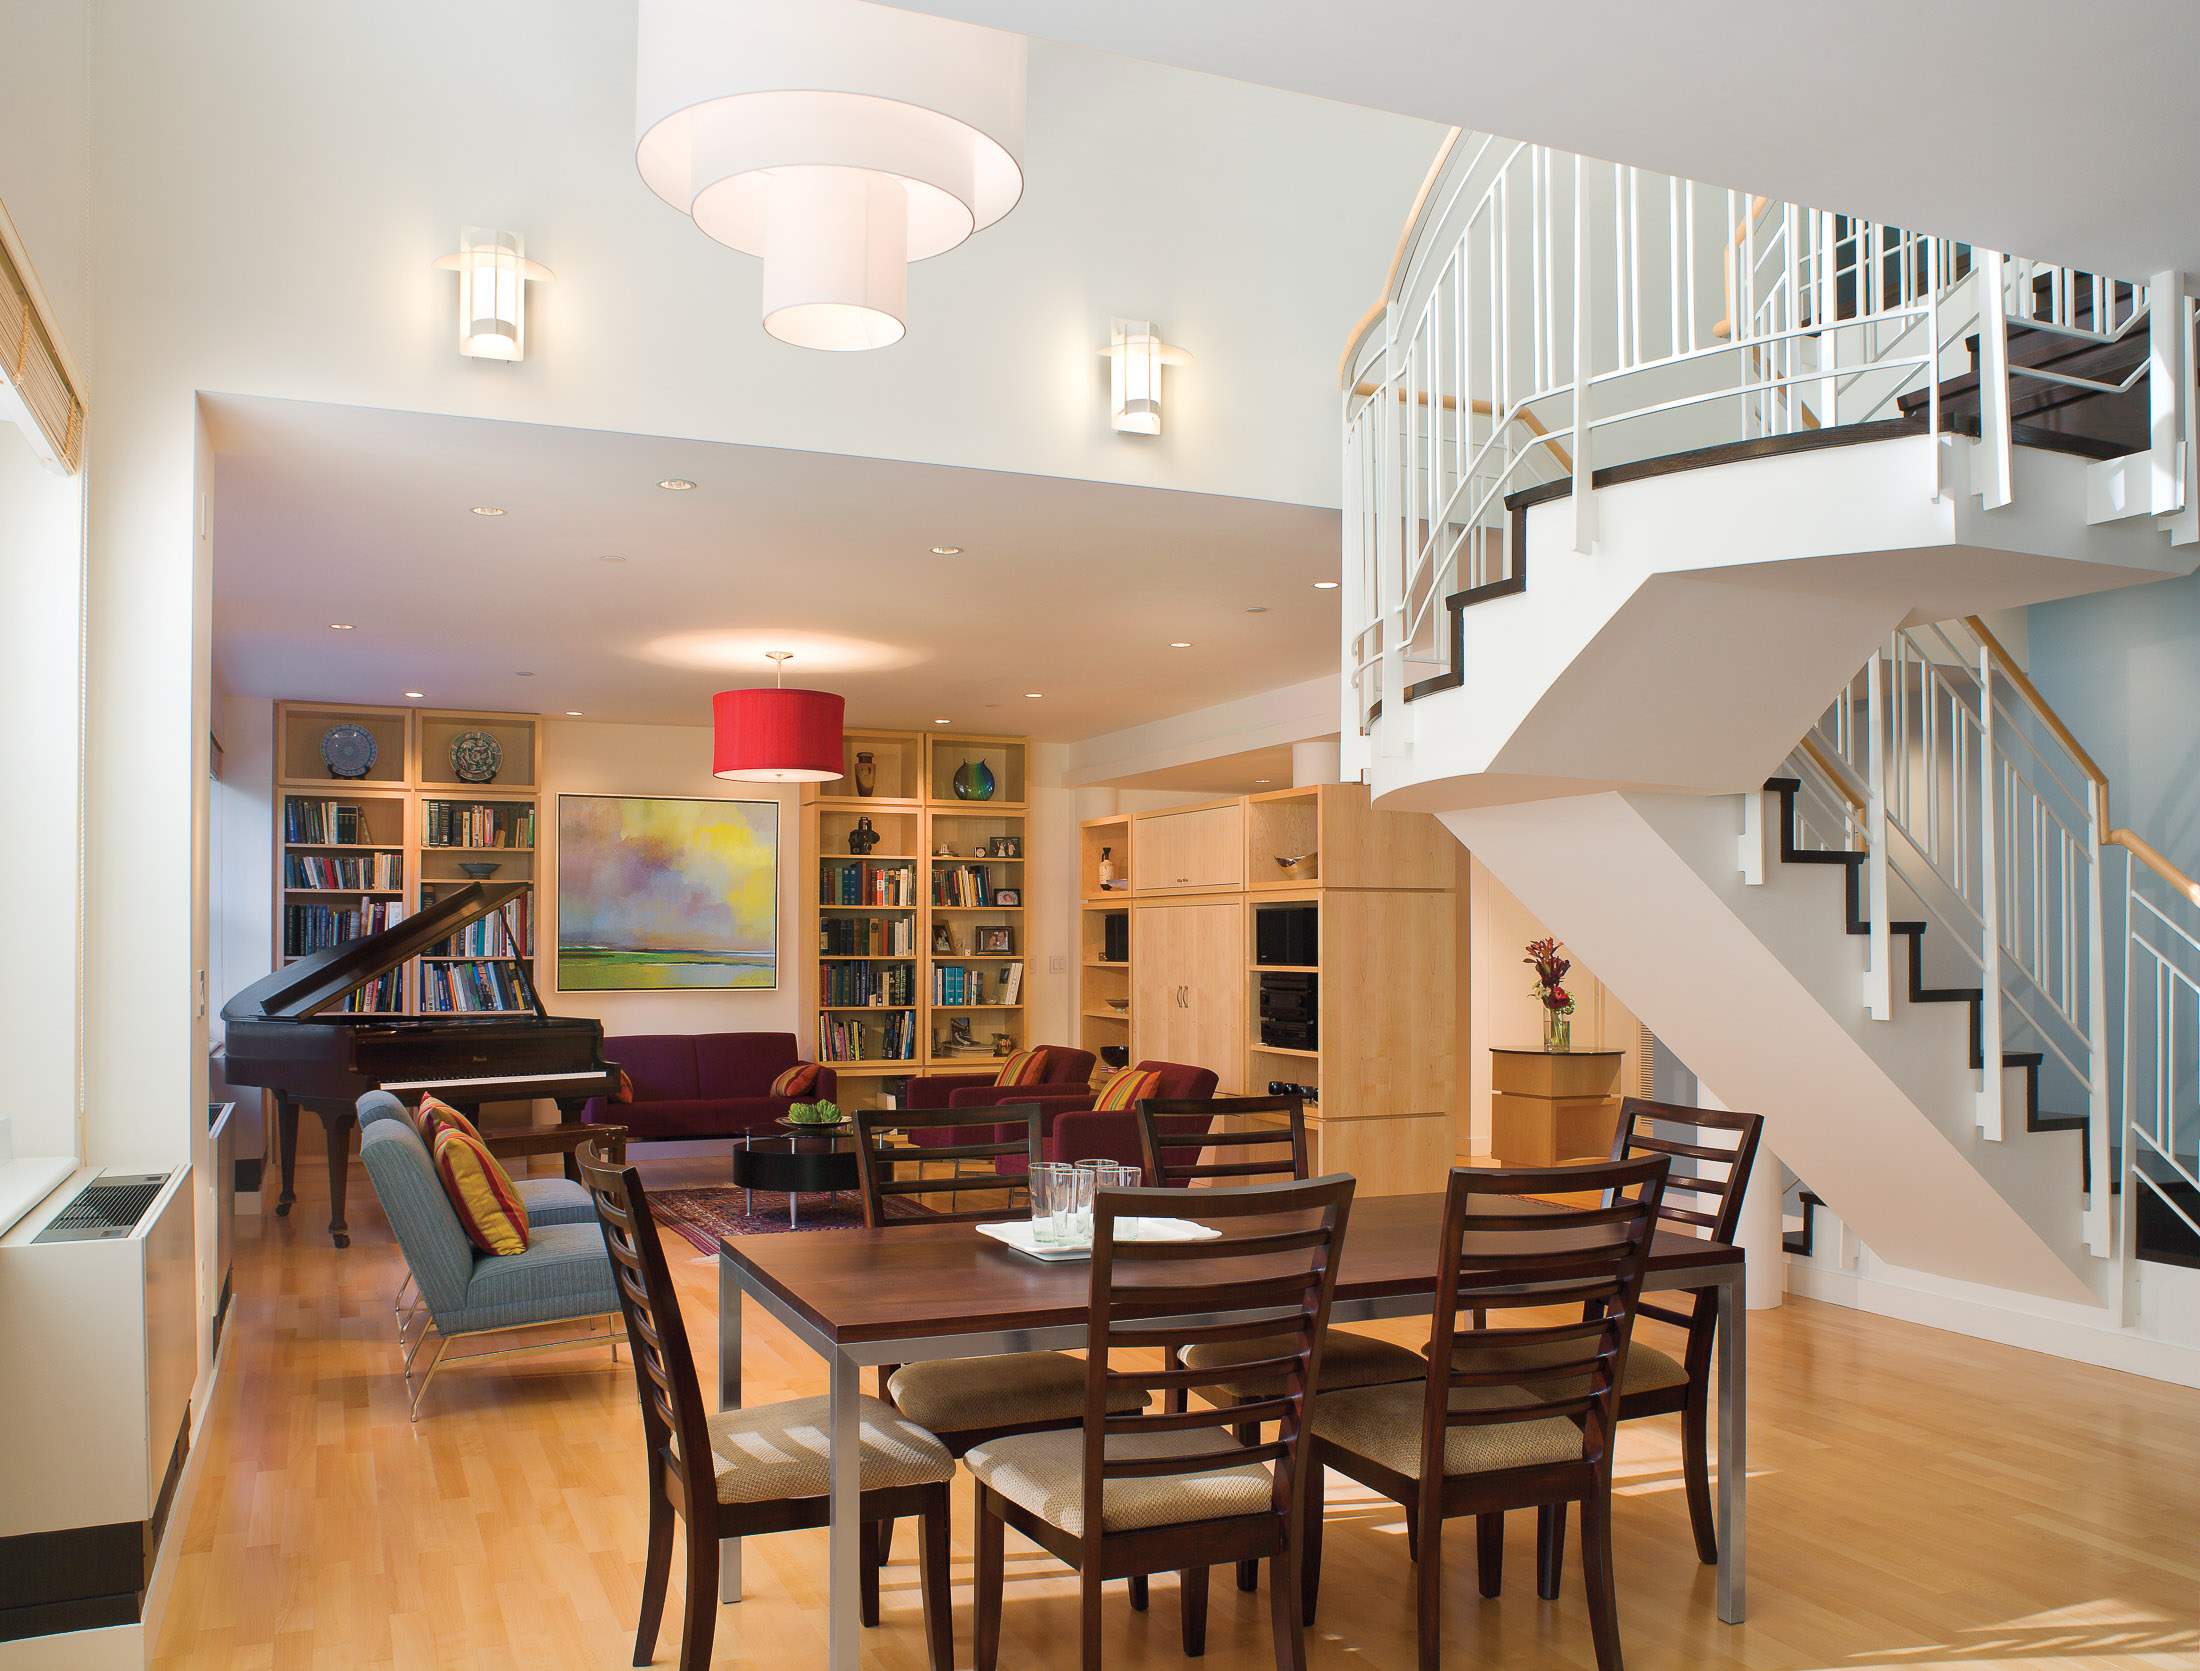 MIT | Edgerton Housemaster Residence